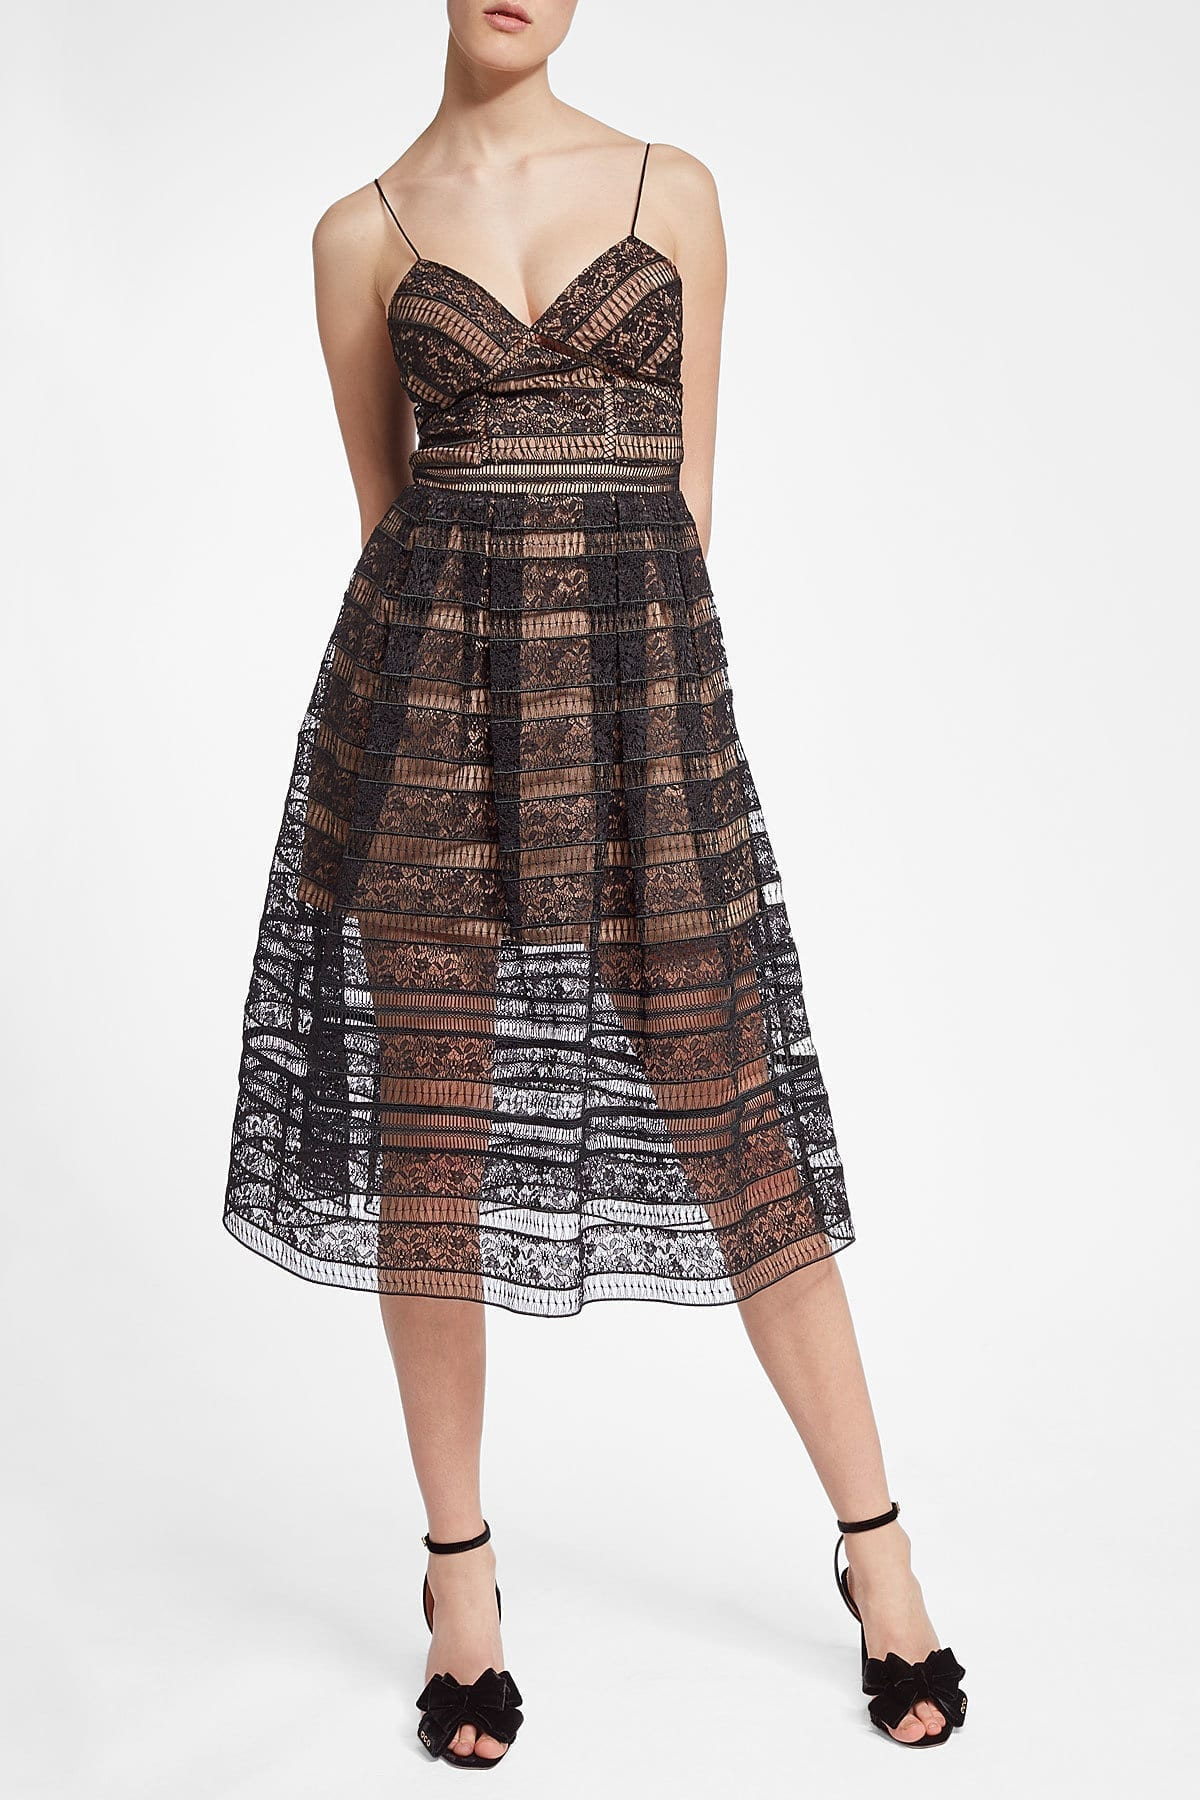 SELF-PORTRAIT Lace Midi Black Dress